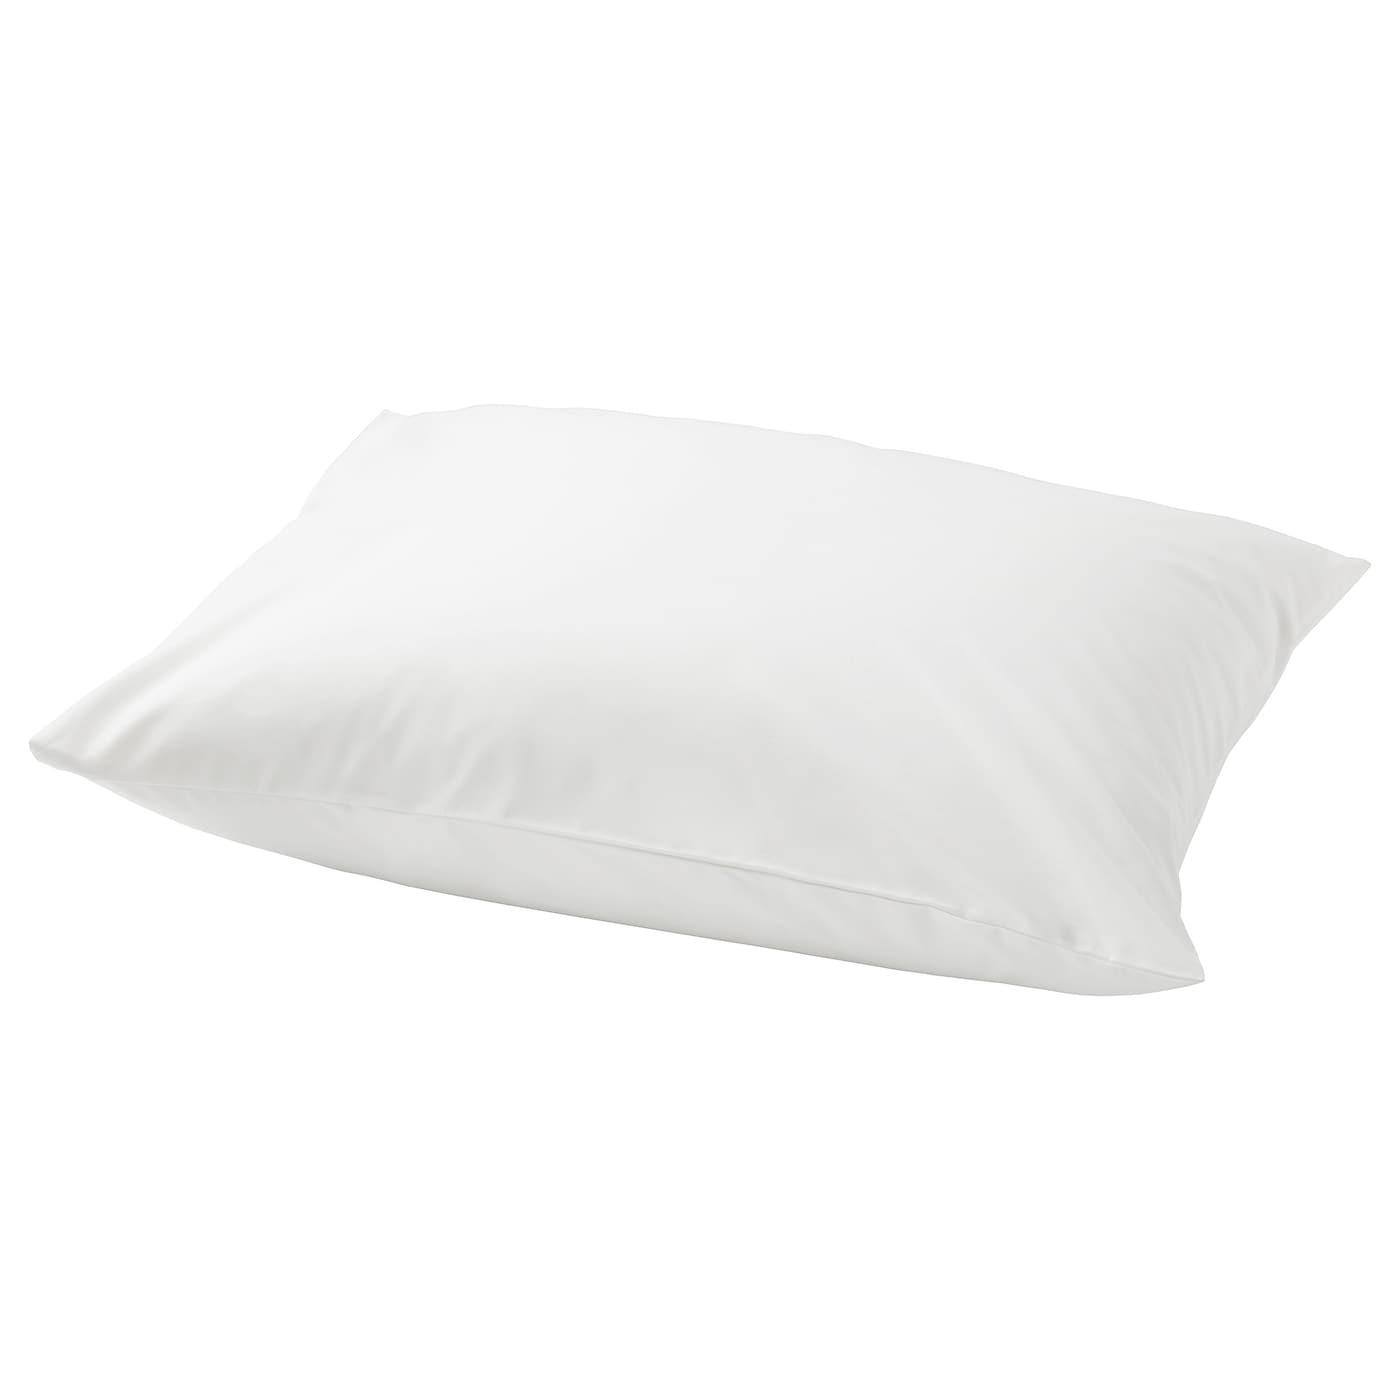 ullvide drap housse blanc 140 x 200 cm ikea. Black Bedroom Furniture Sets. Home Design Ideas